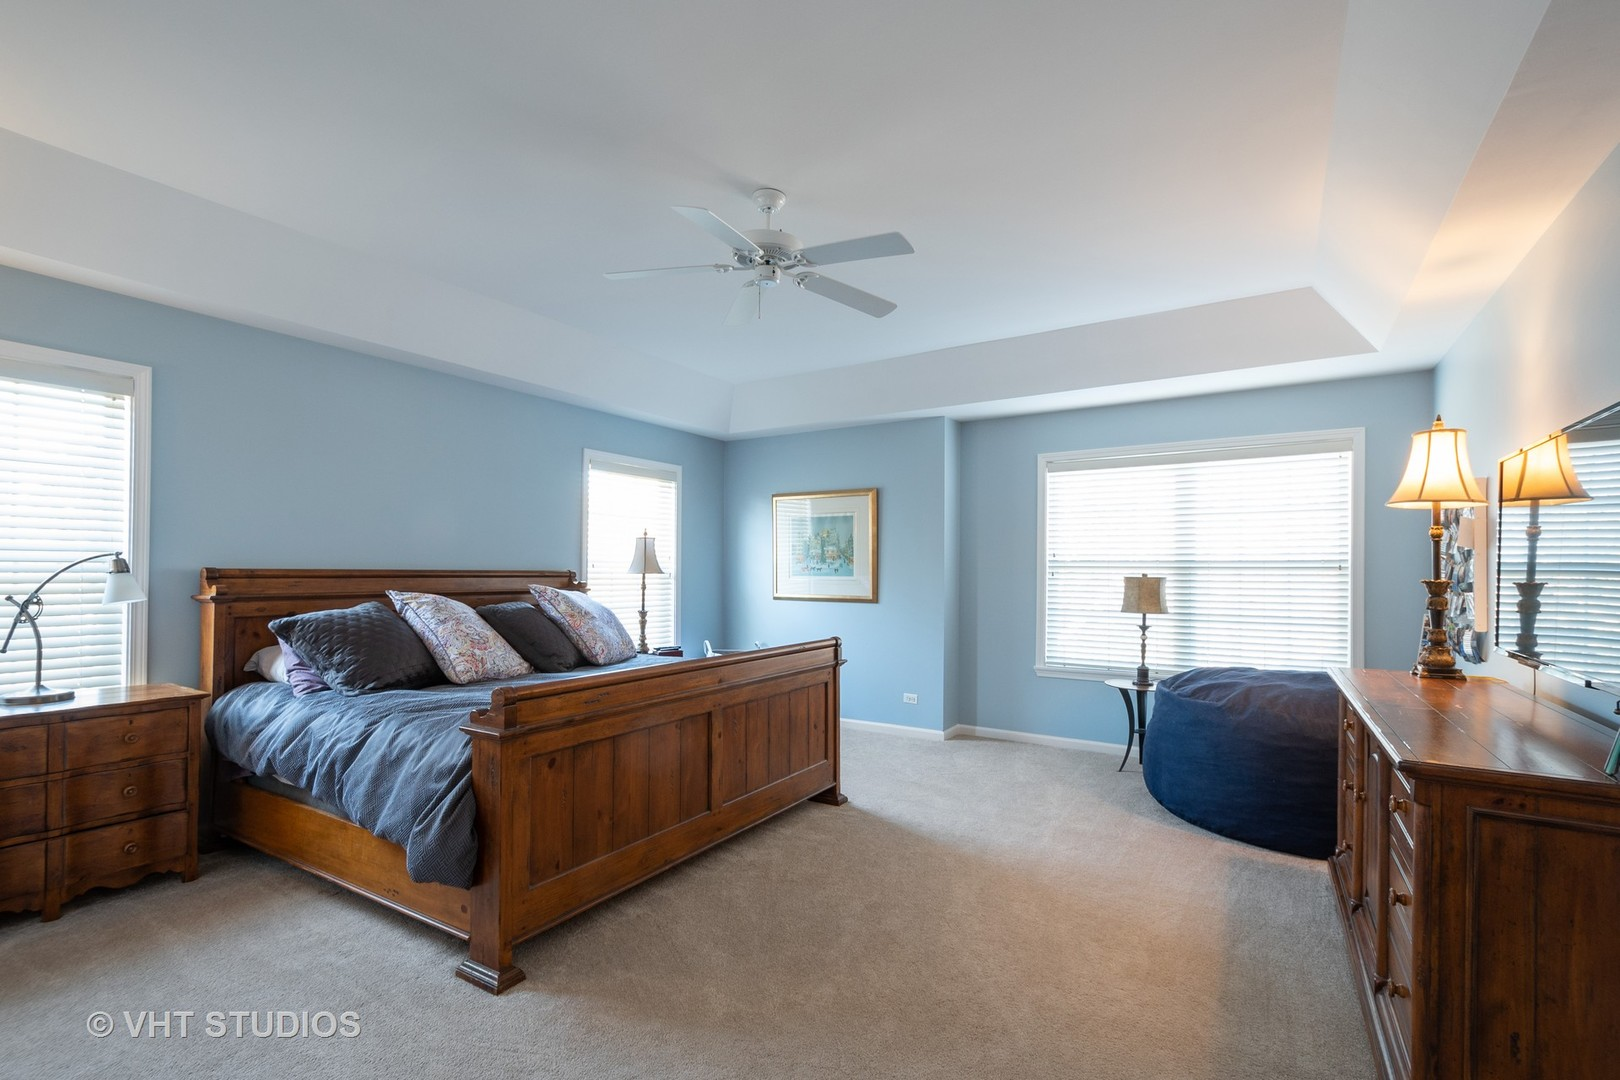 210 Congressional, Vernon Hills, Illinois, 60061